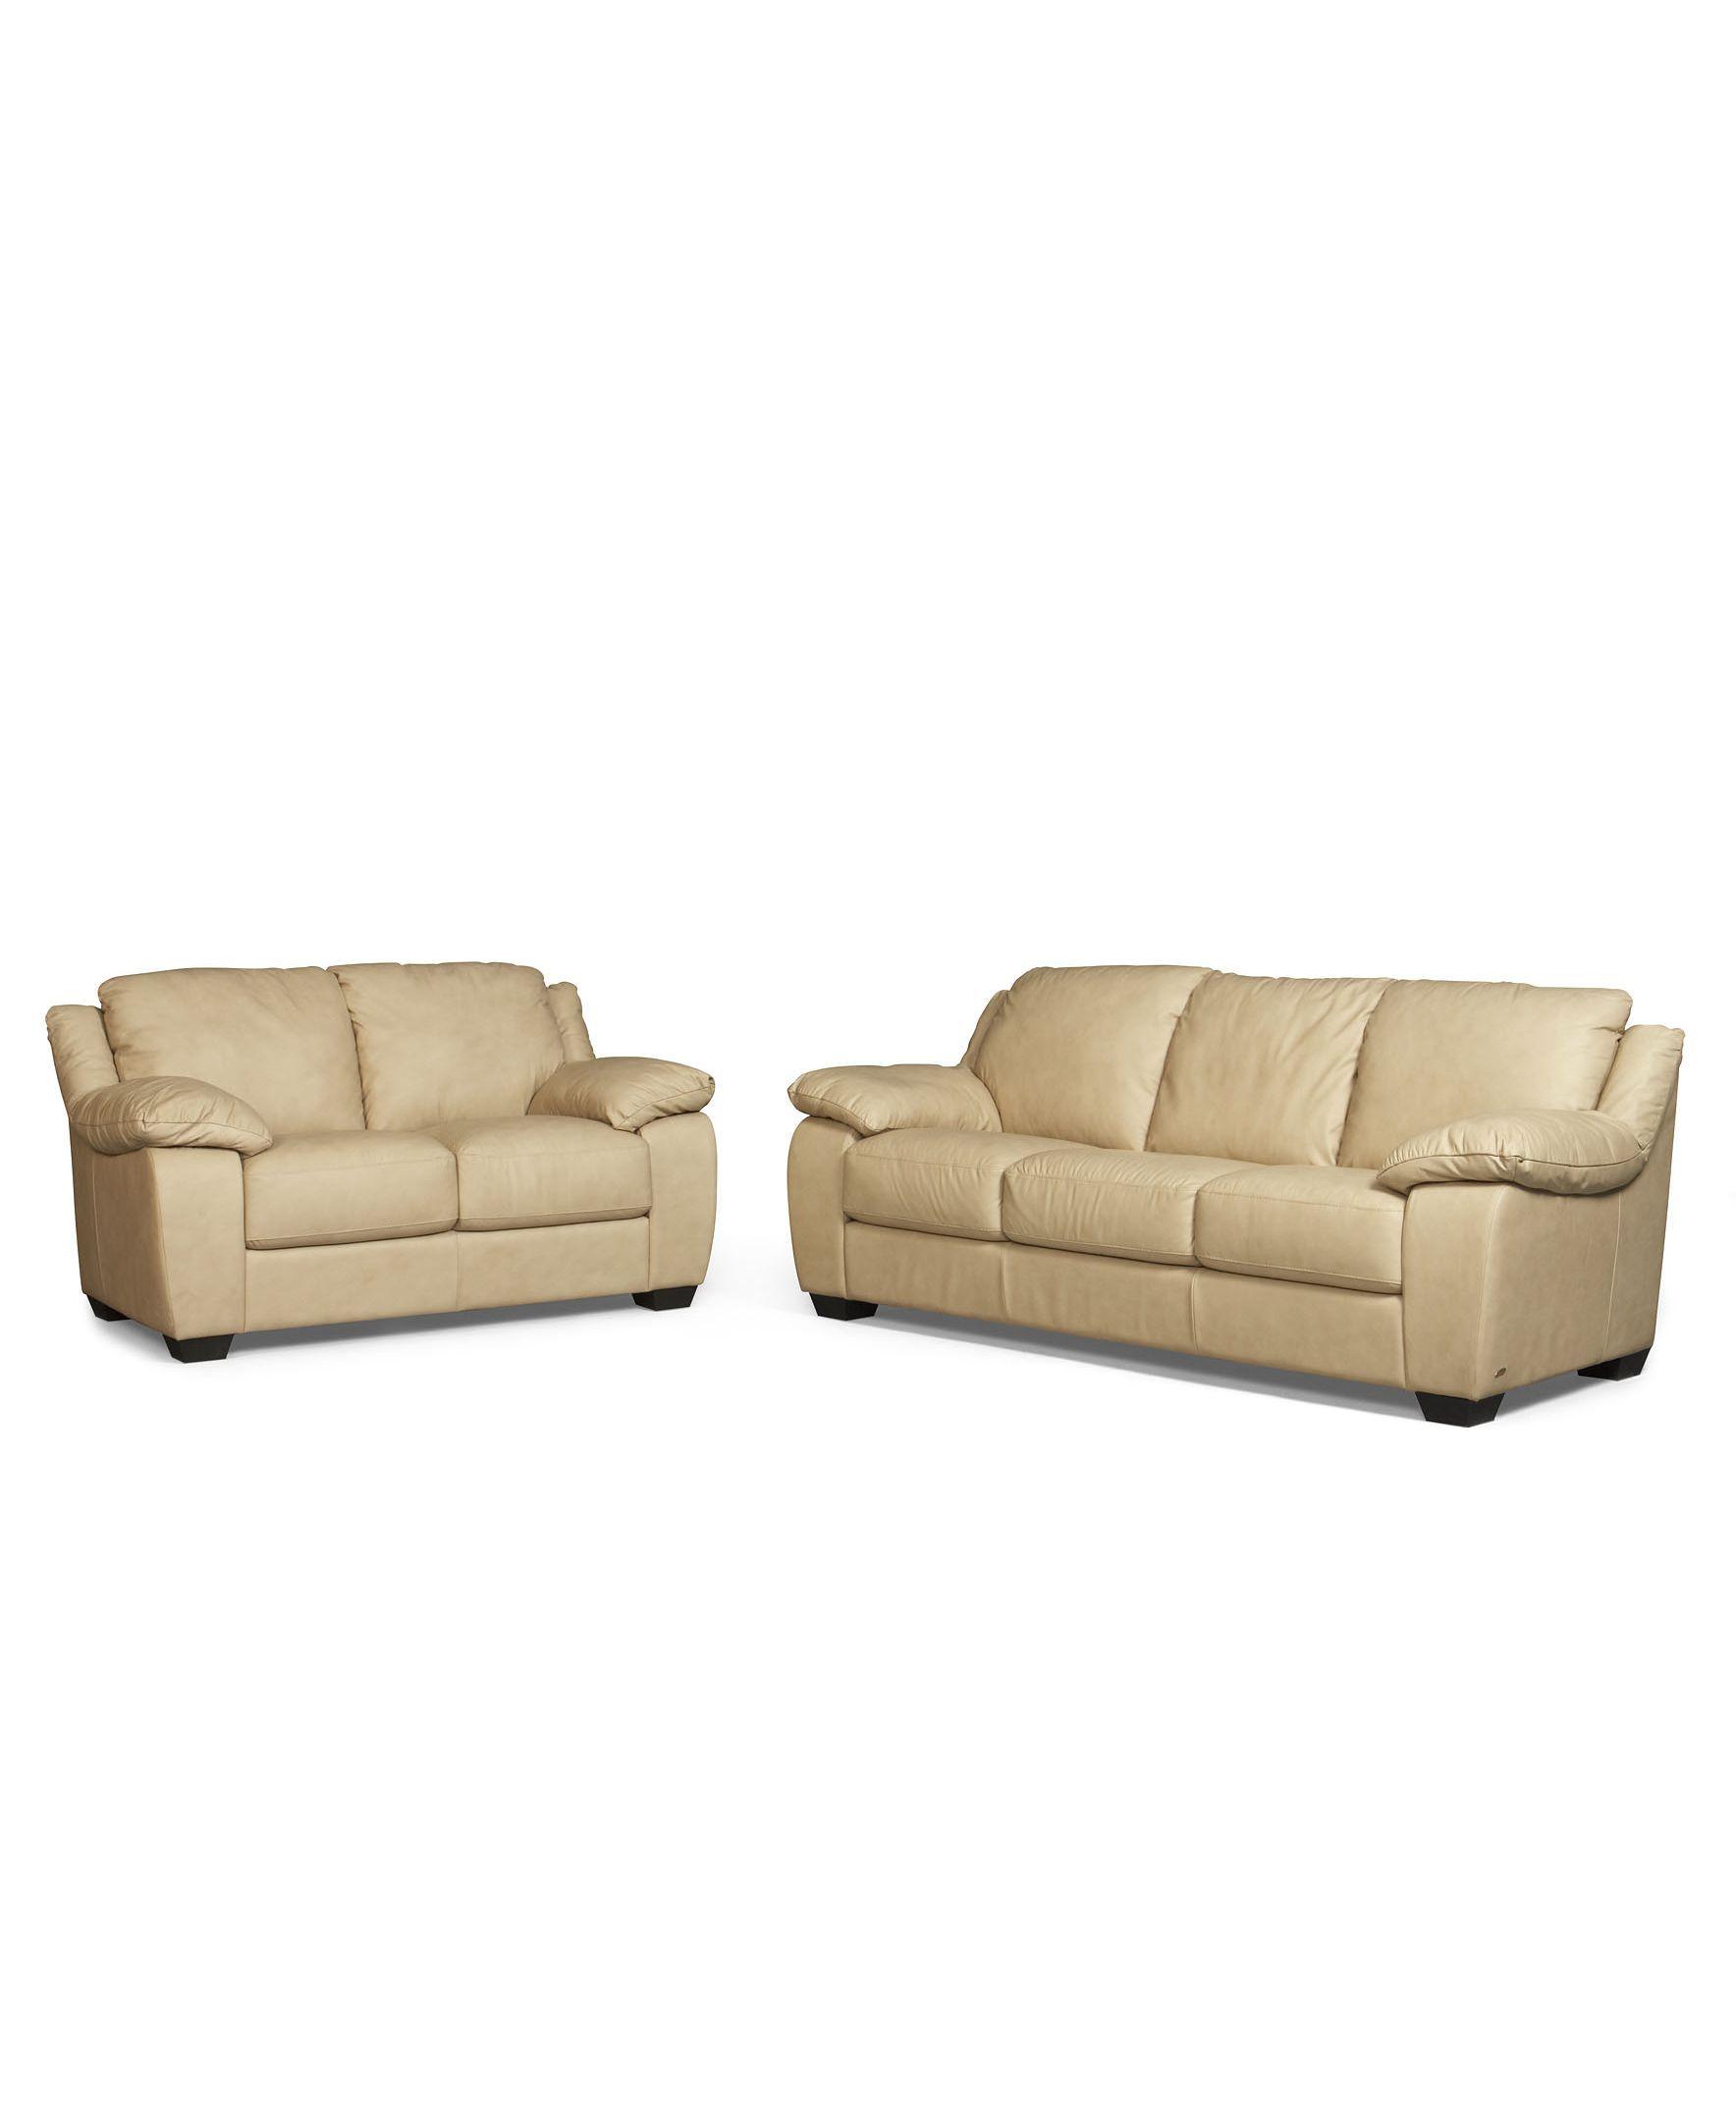 Blair 2 Piece Leather Sofa Set: Sofa And Love Seat